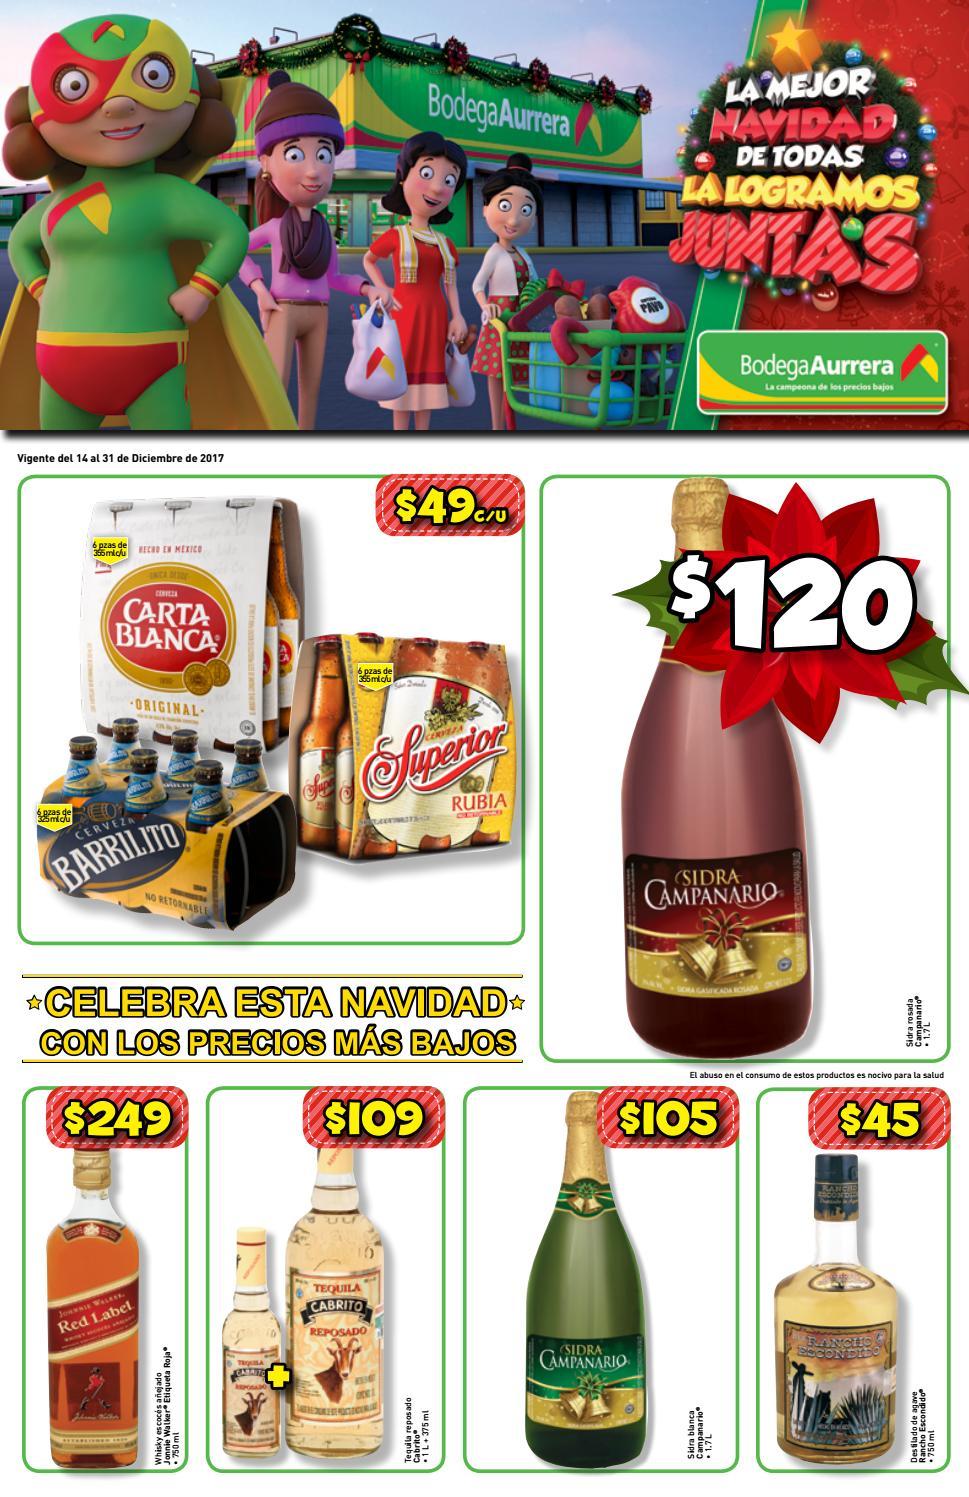 Celebra La Navidad A Lo Grande By Bodega Aurrera Issuu